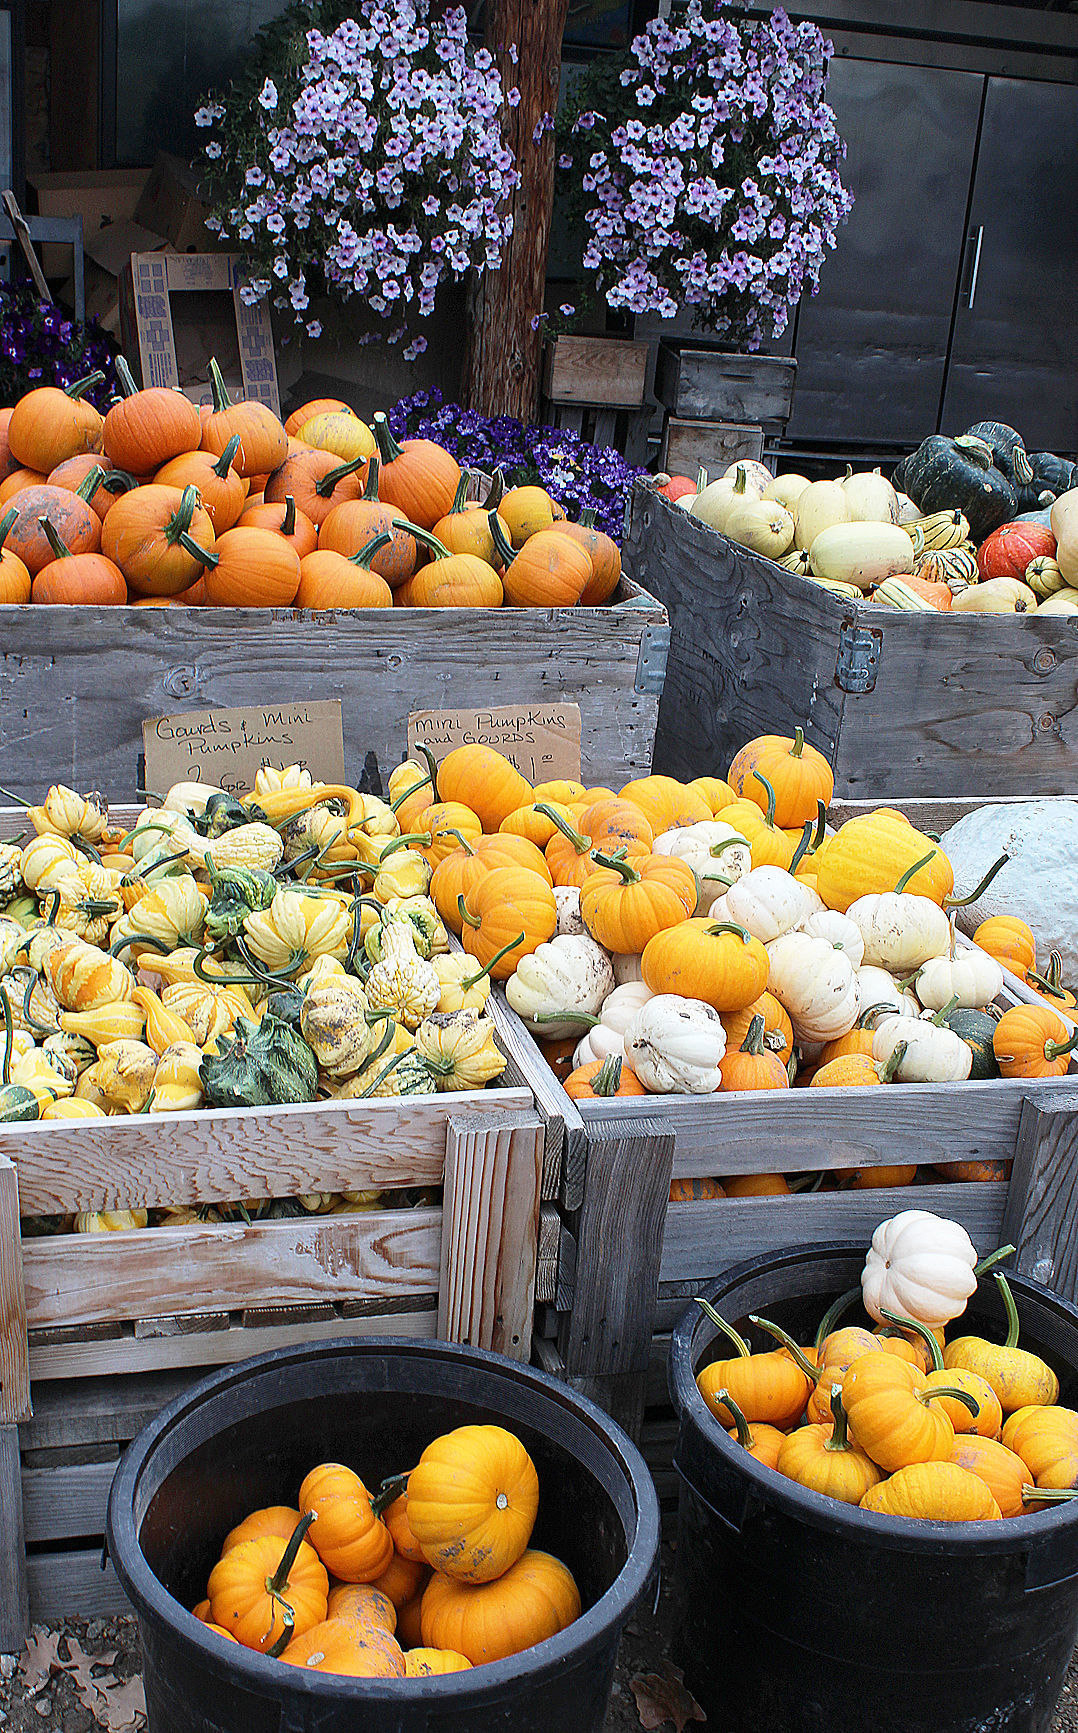 Moeller's fall produce